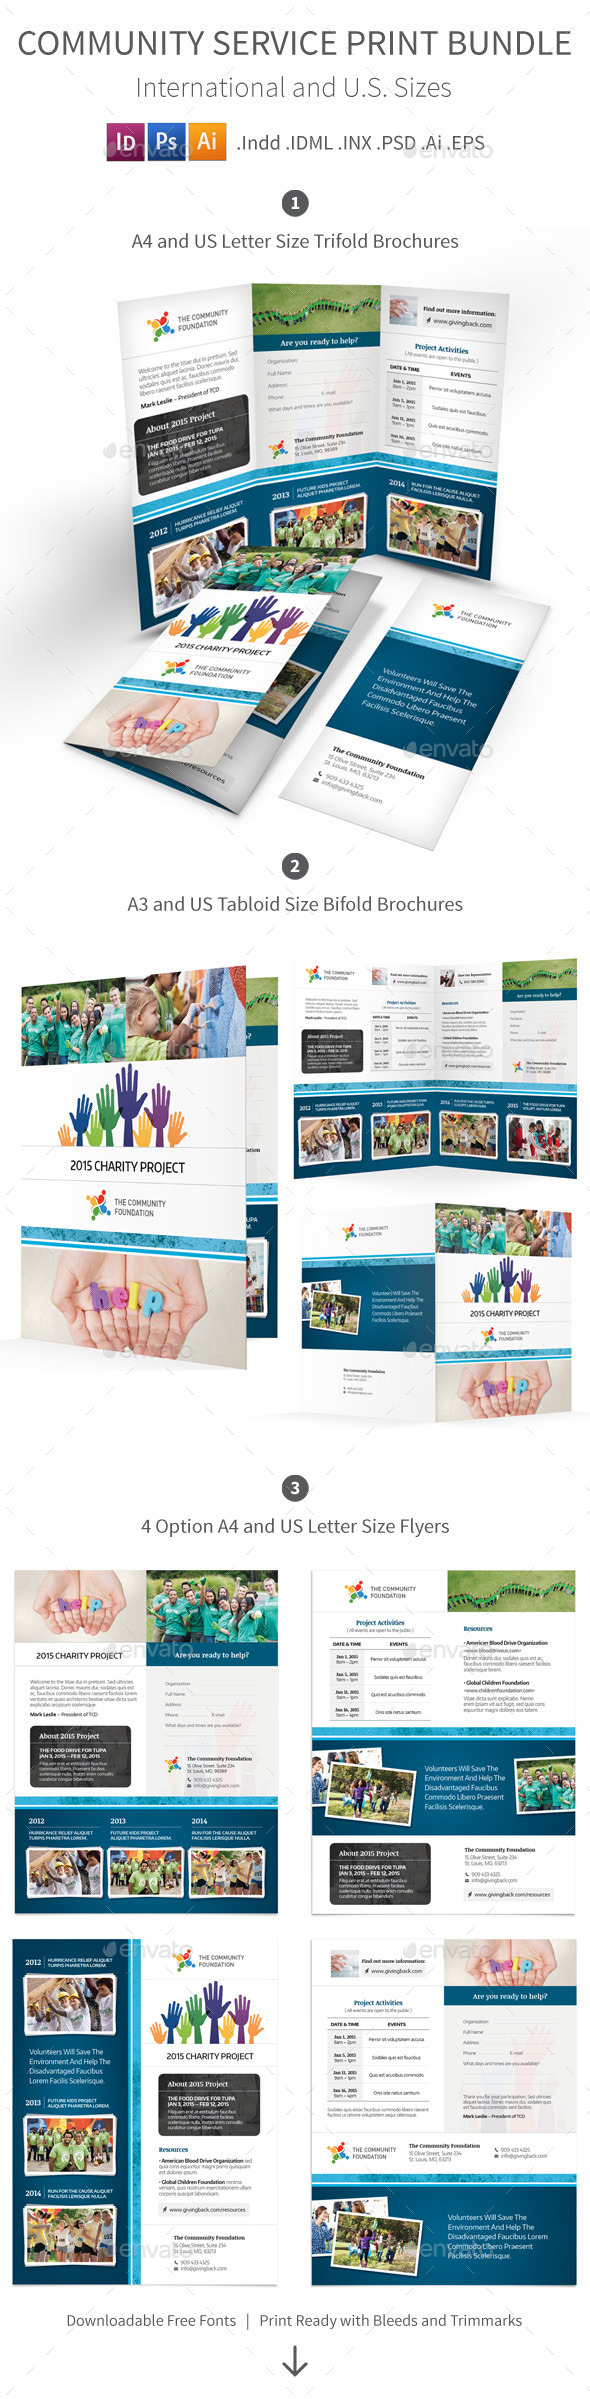 Community Service Print Bundle - Informational Brochures